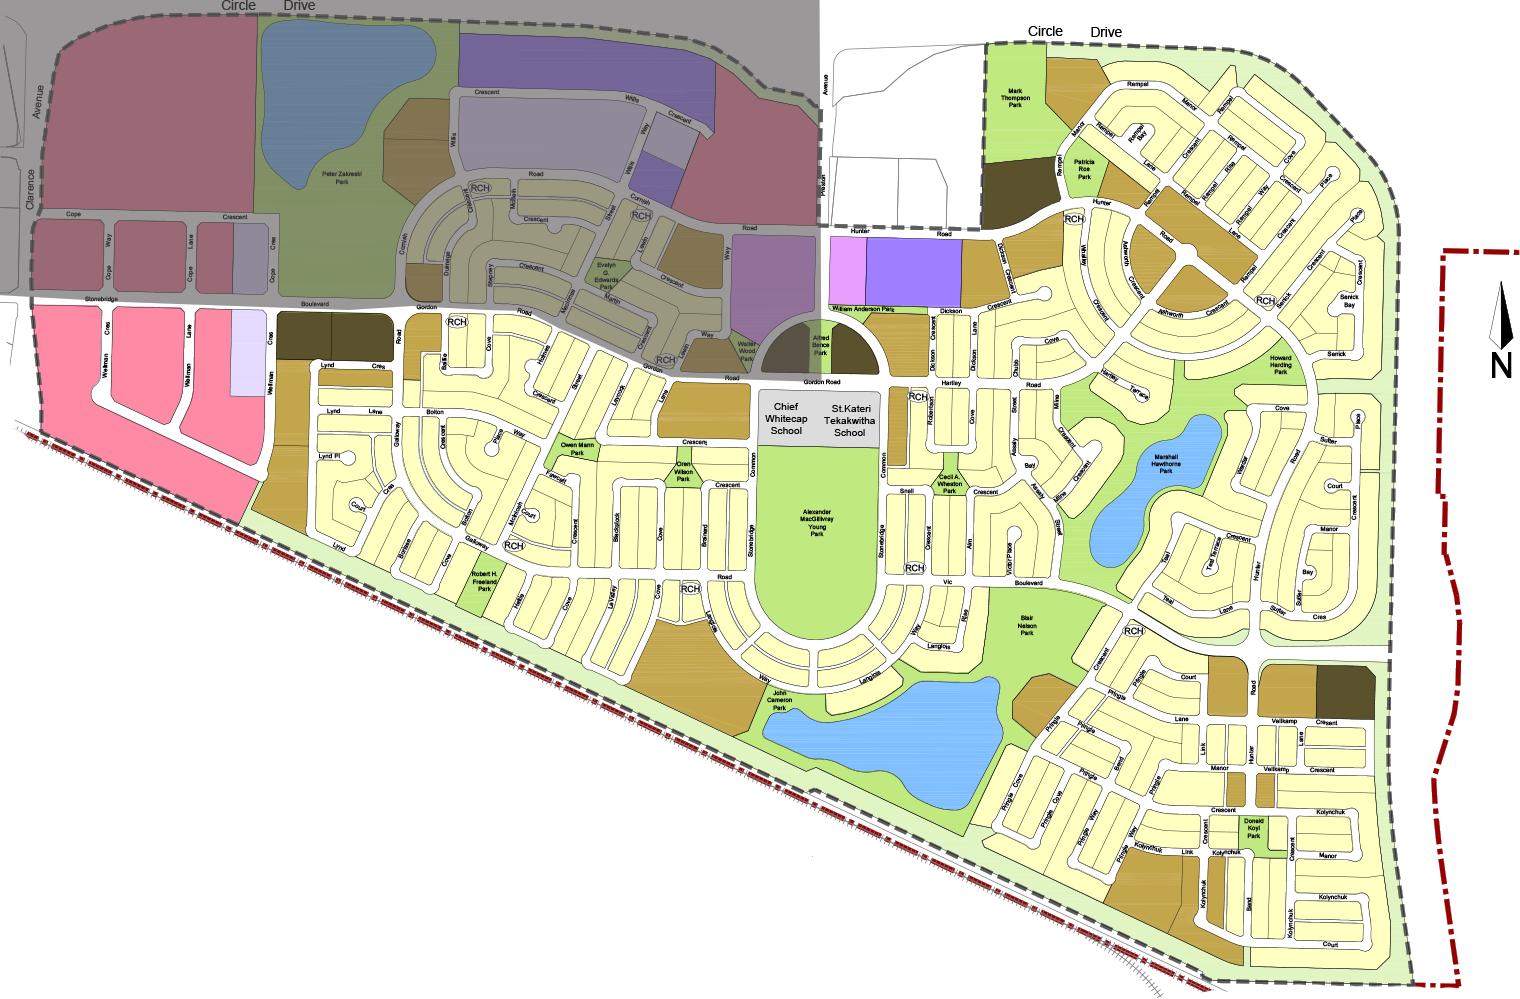 Northwest – North of Stonebridge Boulevard and Gordon Road, West of Preston and Alexander MacGillivary park